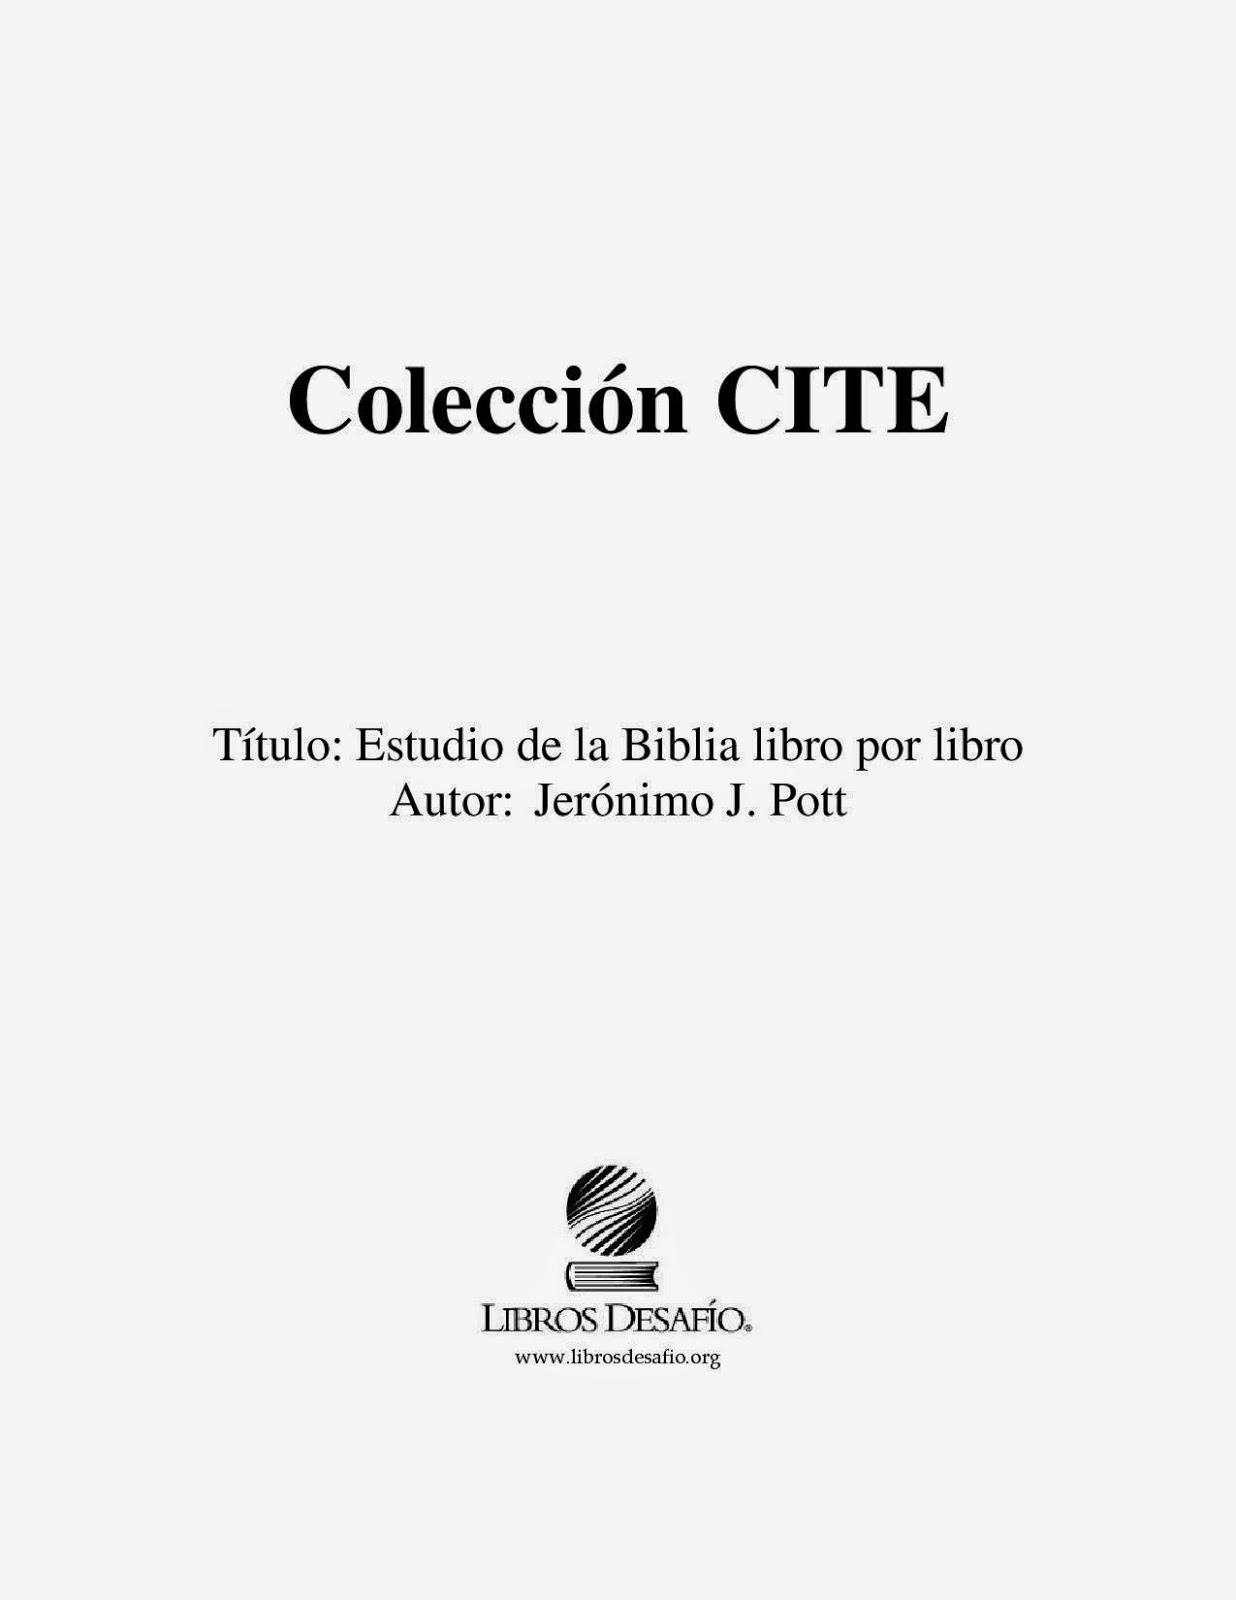 Jerónimo J. Pott-Estudio De La Biblia Libro Por Libro-